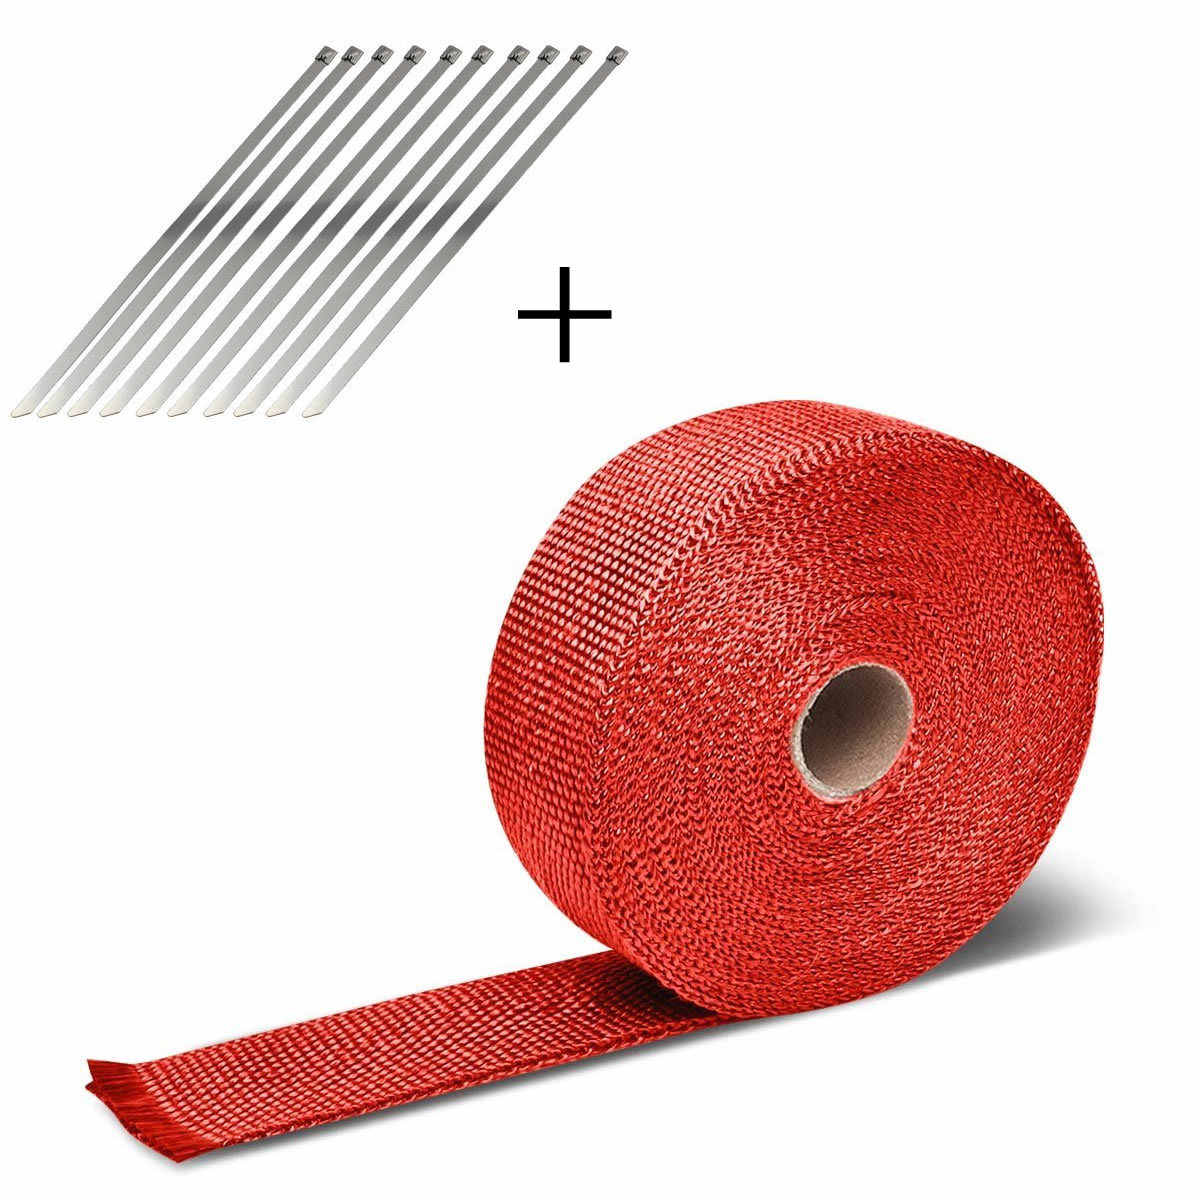 10 4m モーター断熱テープ排気管コレクタターボ高断熱ラップ黒 10 ネックレス